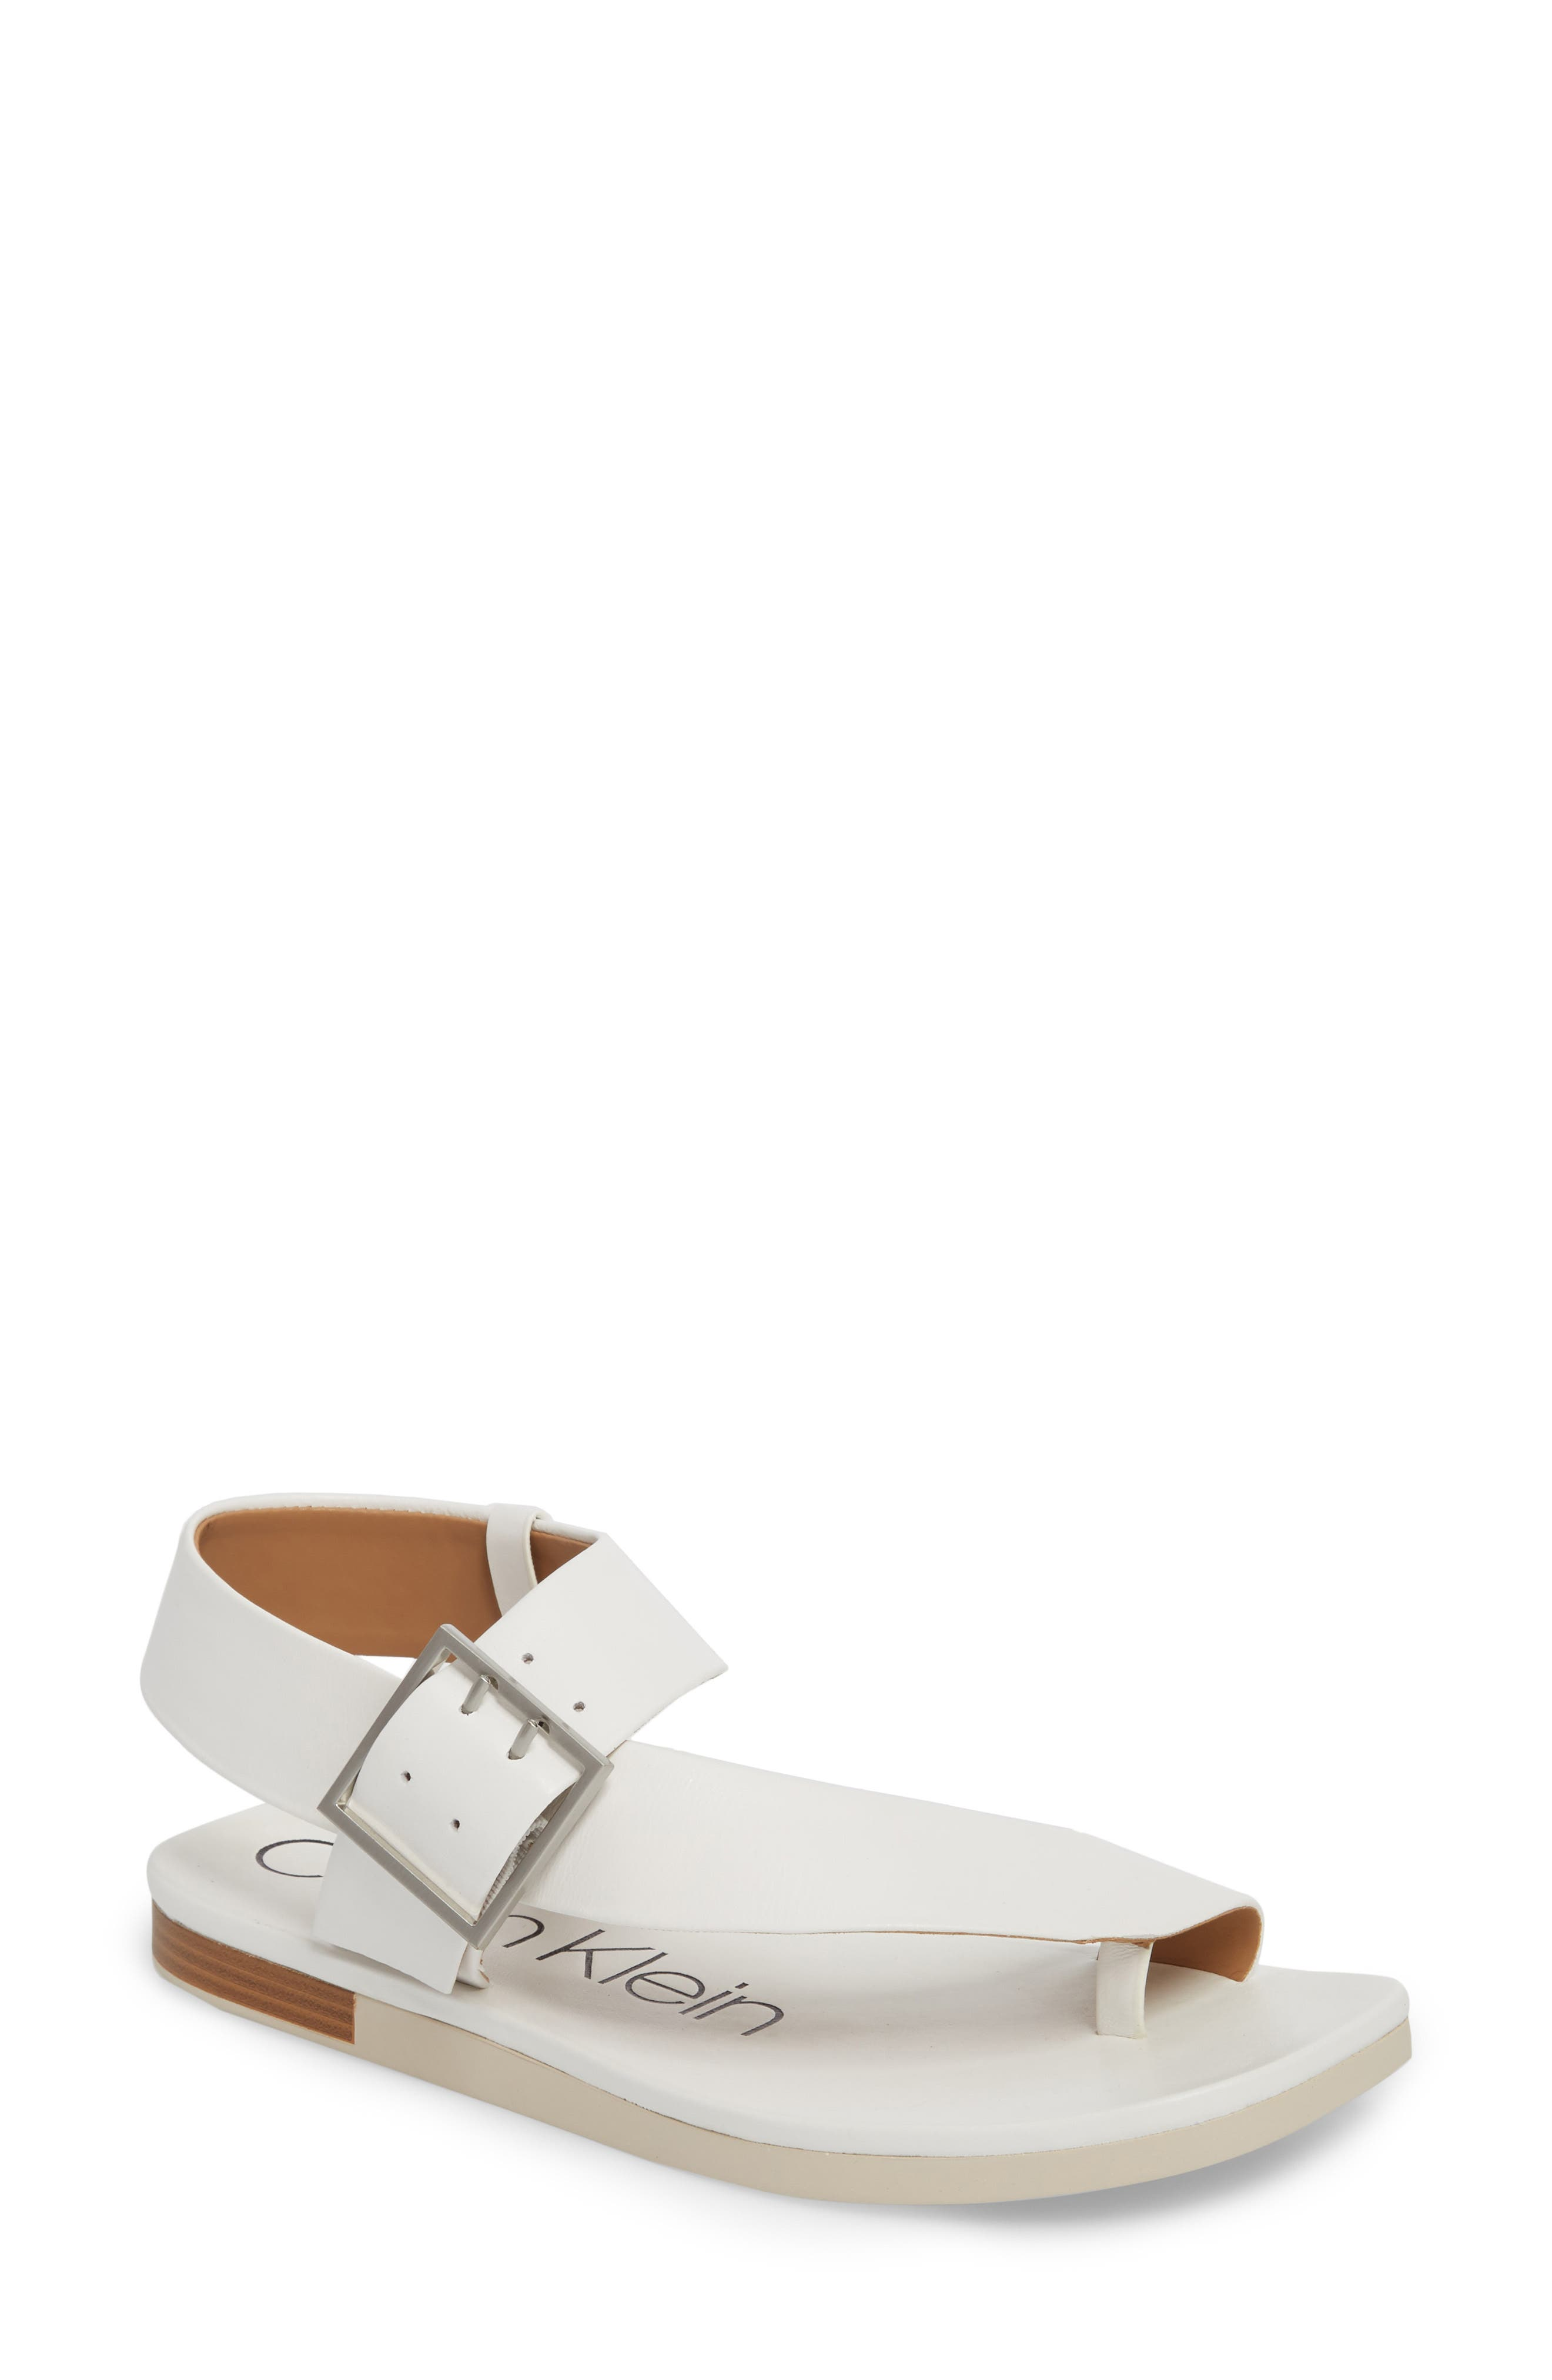 Rivita Sandal,                         Main,                         color, Platinum White Leather